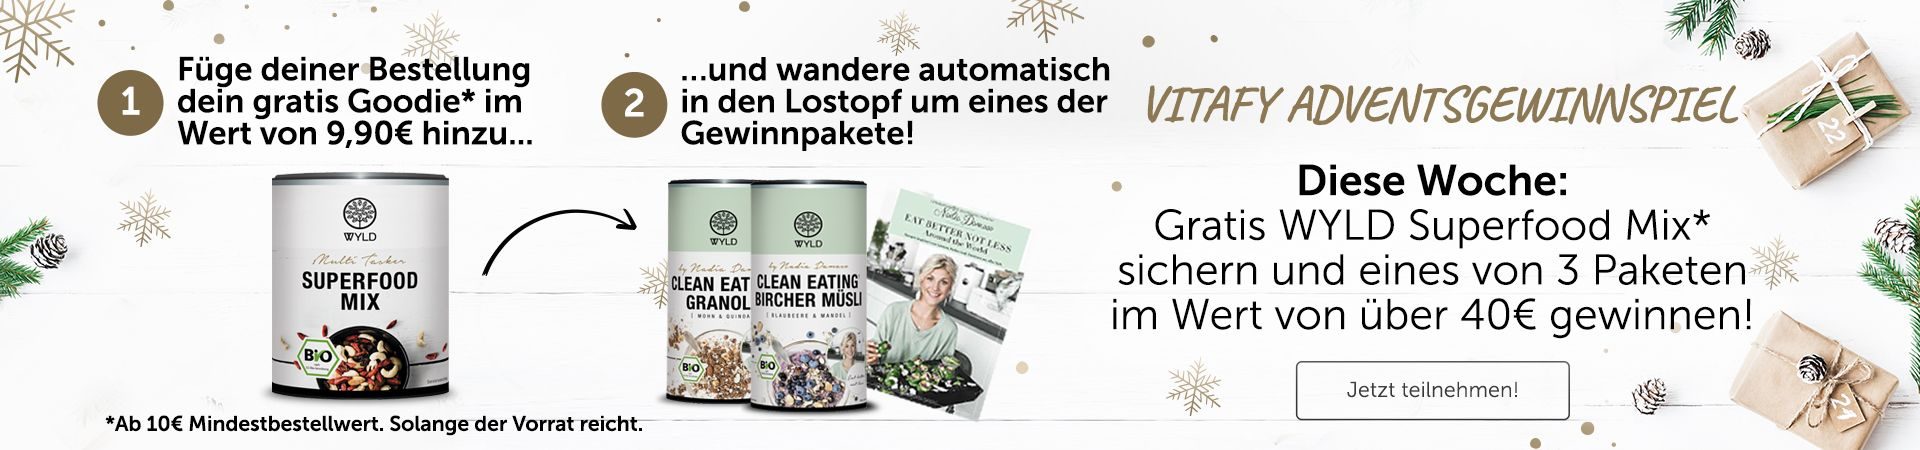 20181203_Adventskalender-Gewinnspiel_Woche2 ON